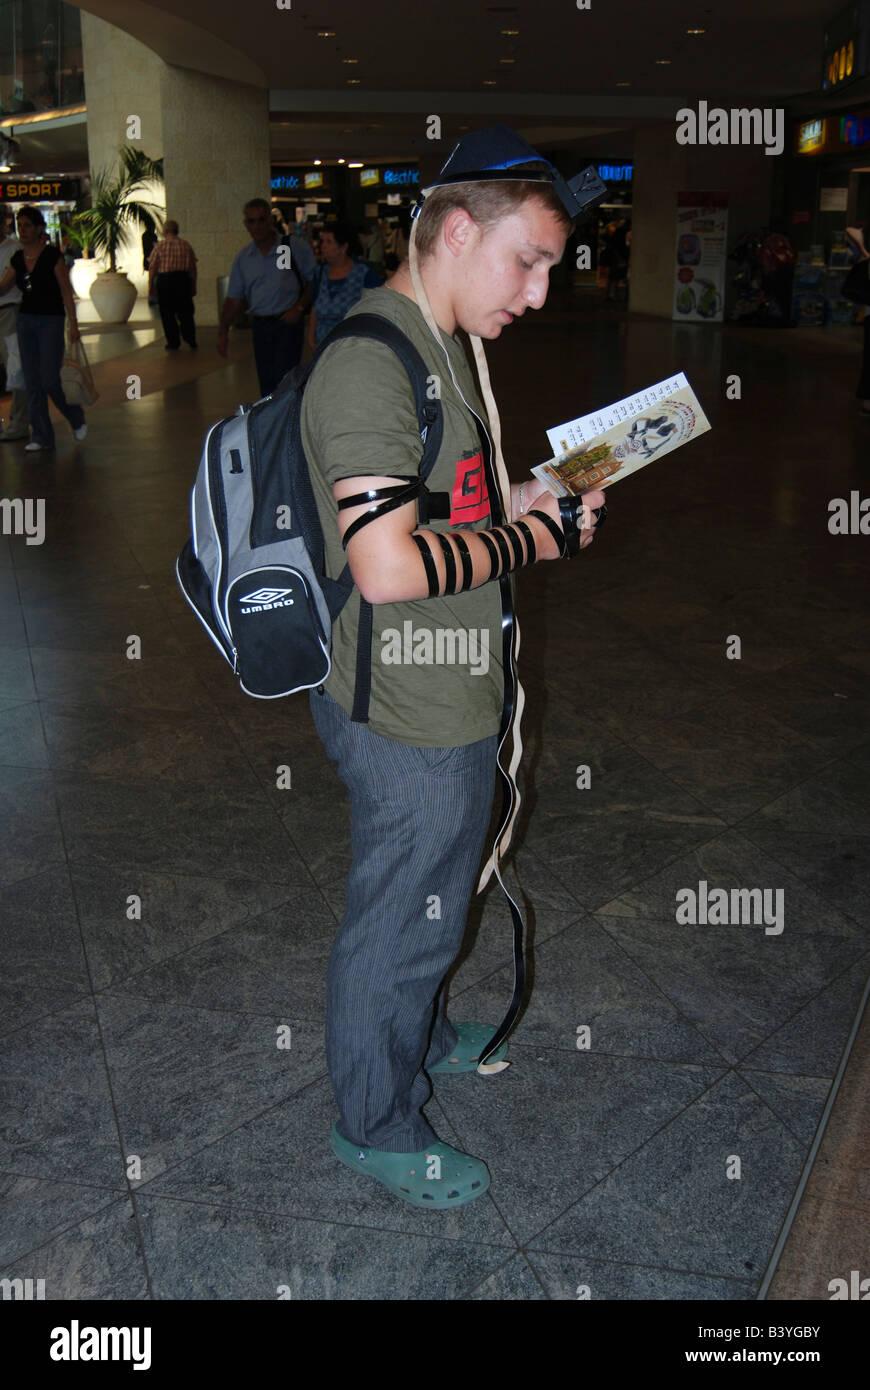 young Jewish man praying At Ben Gurion Airport Israel - Stock Image